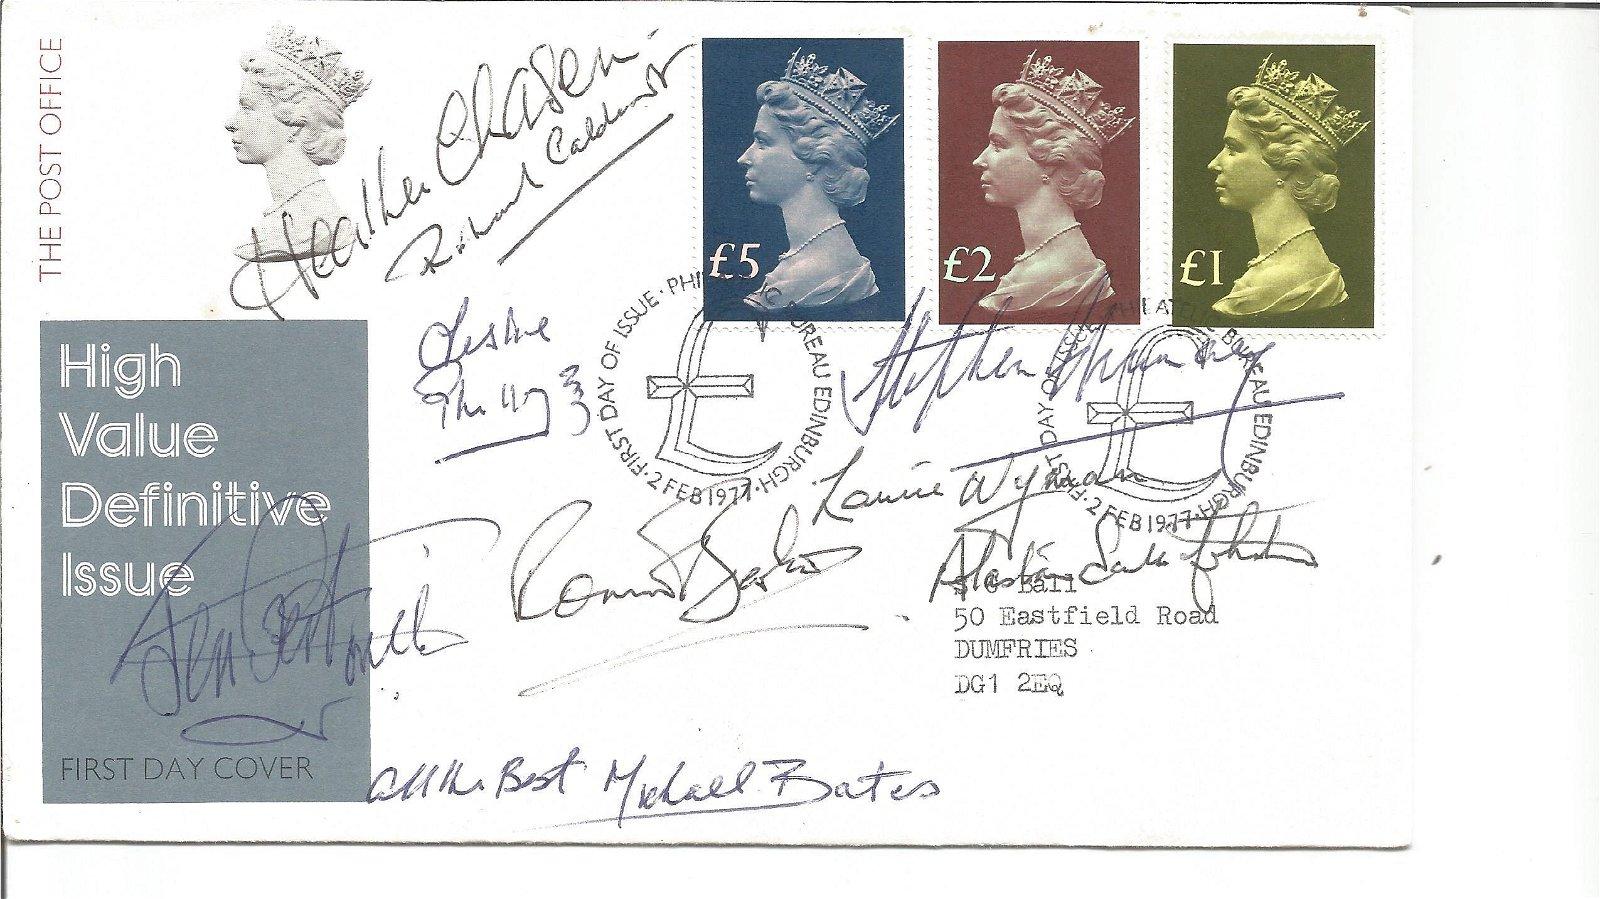 Heather Chasen, Leslie Phillips, Ronnie Barker, Michael